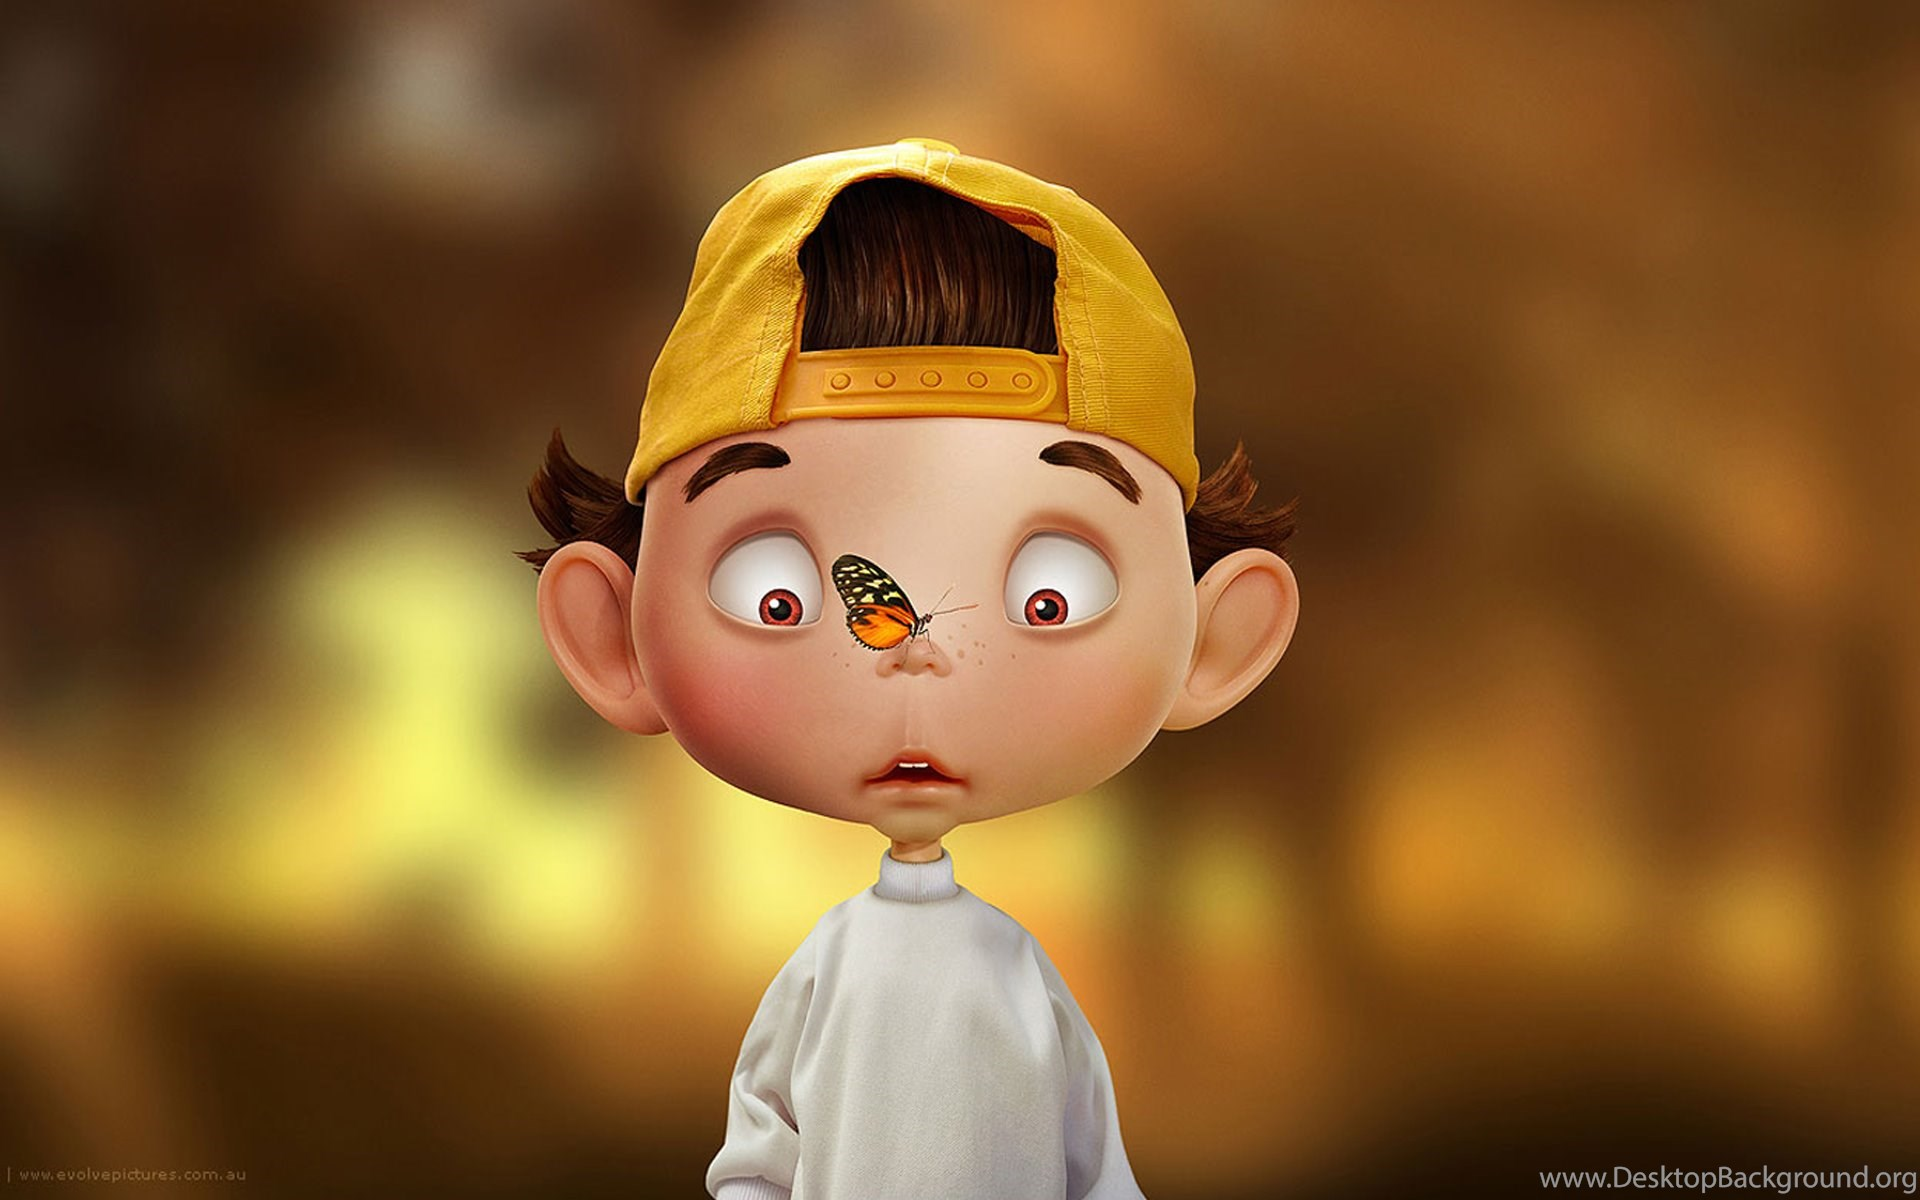 Wallpapers 3D Boys Cartoon Animation HD Desktop Mobile